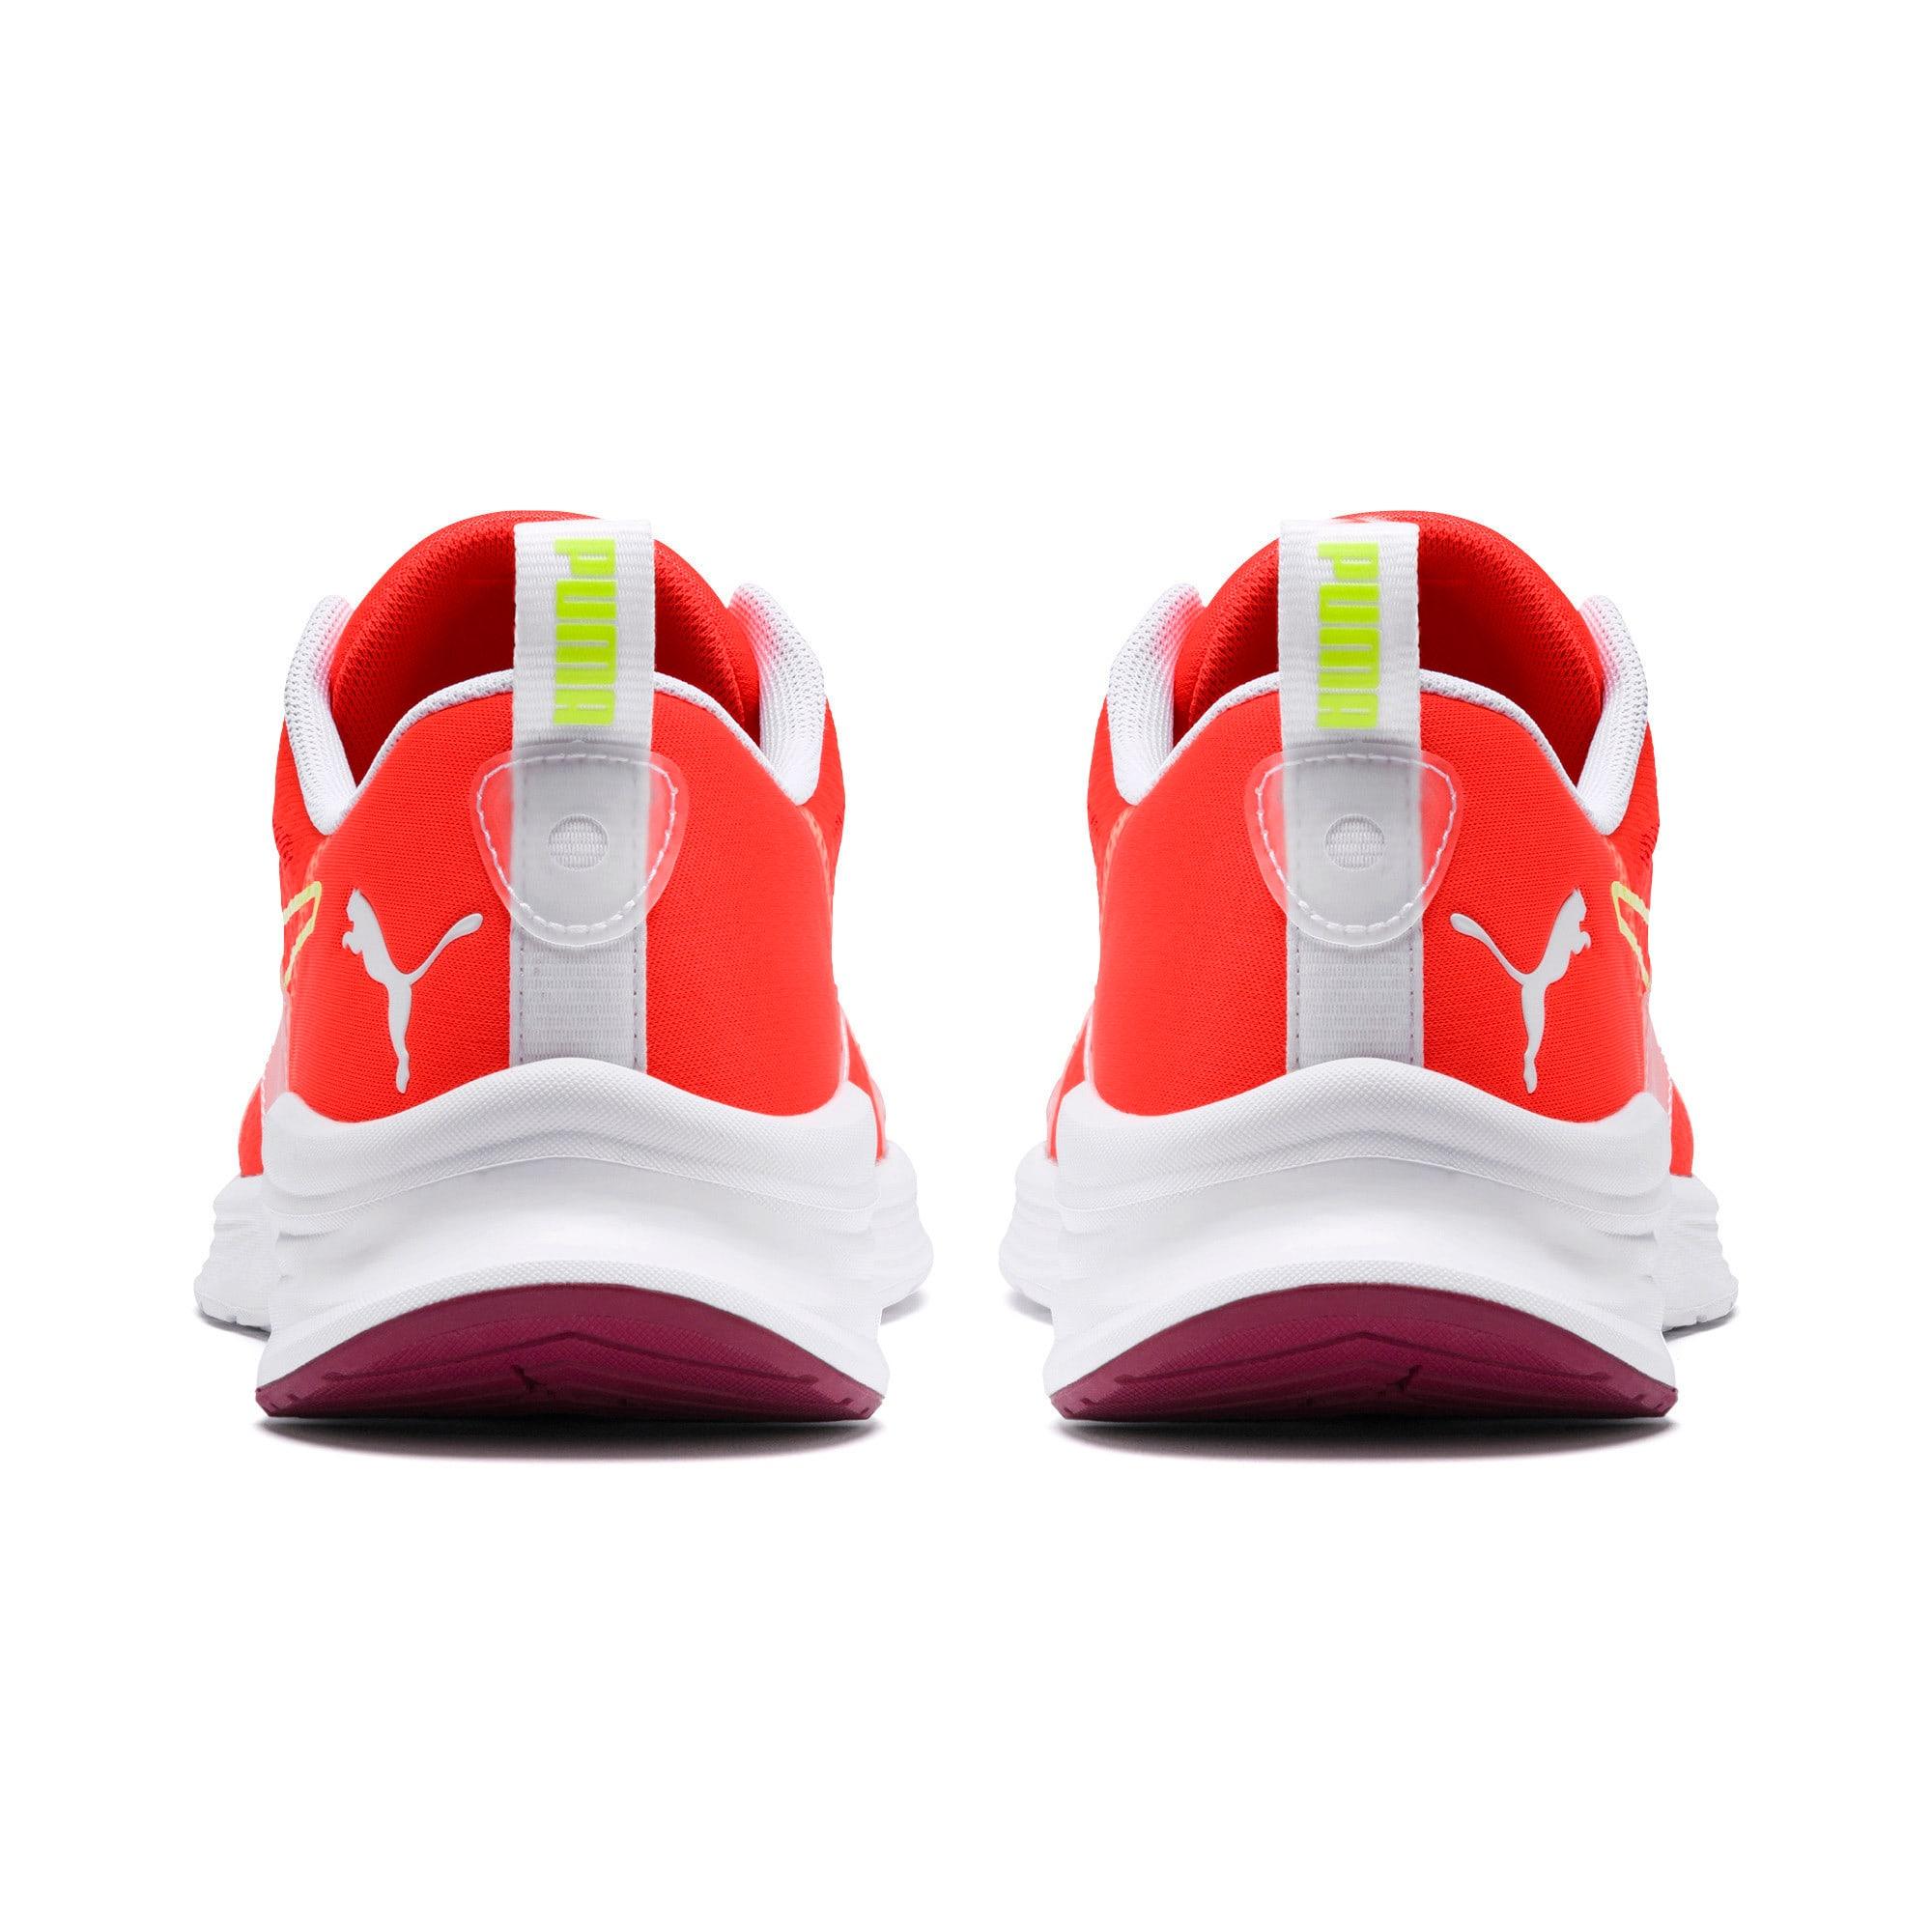 Thumbnail 3 of HYBRID Fuego Men's Running Shoes, Nrgy Red-Rhubarb, medium